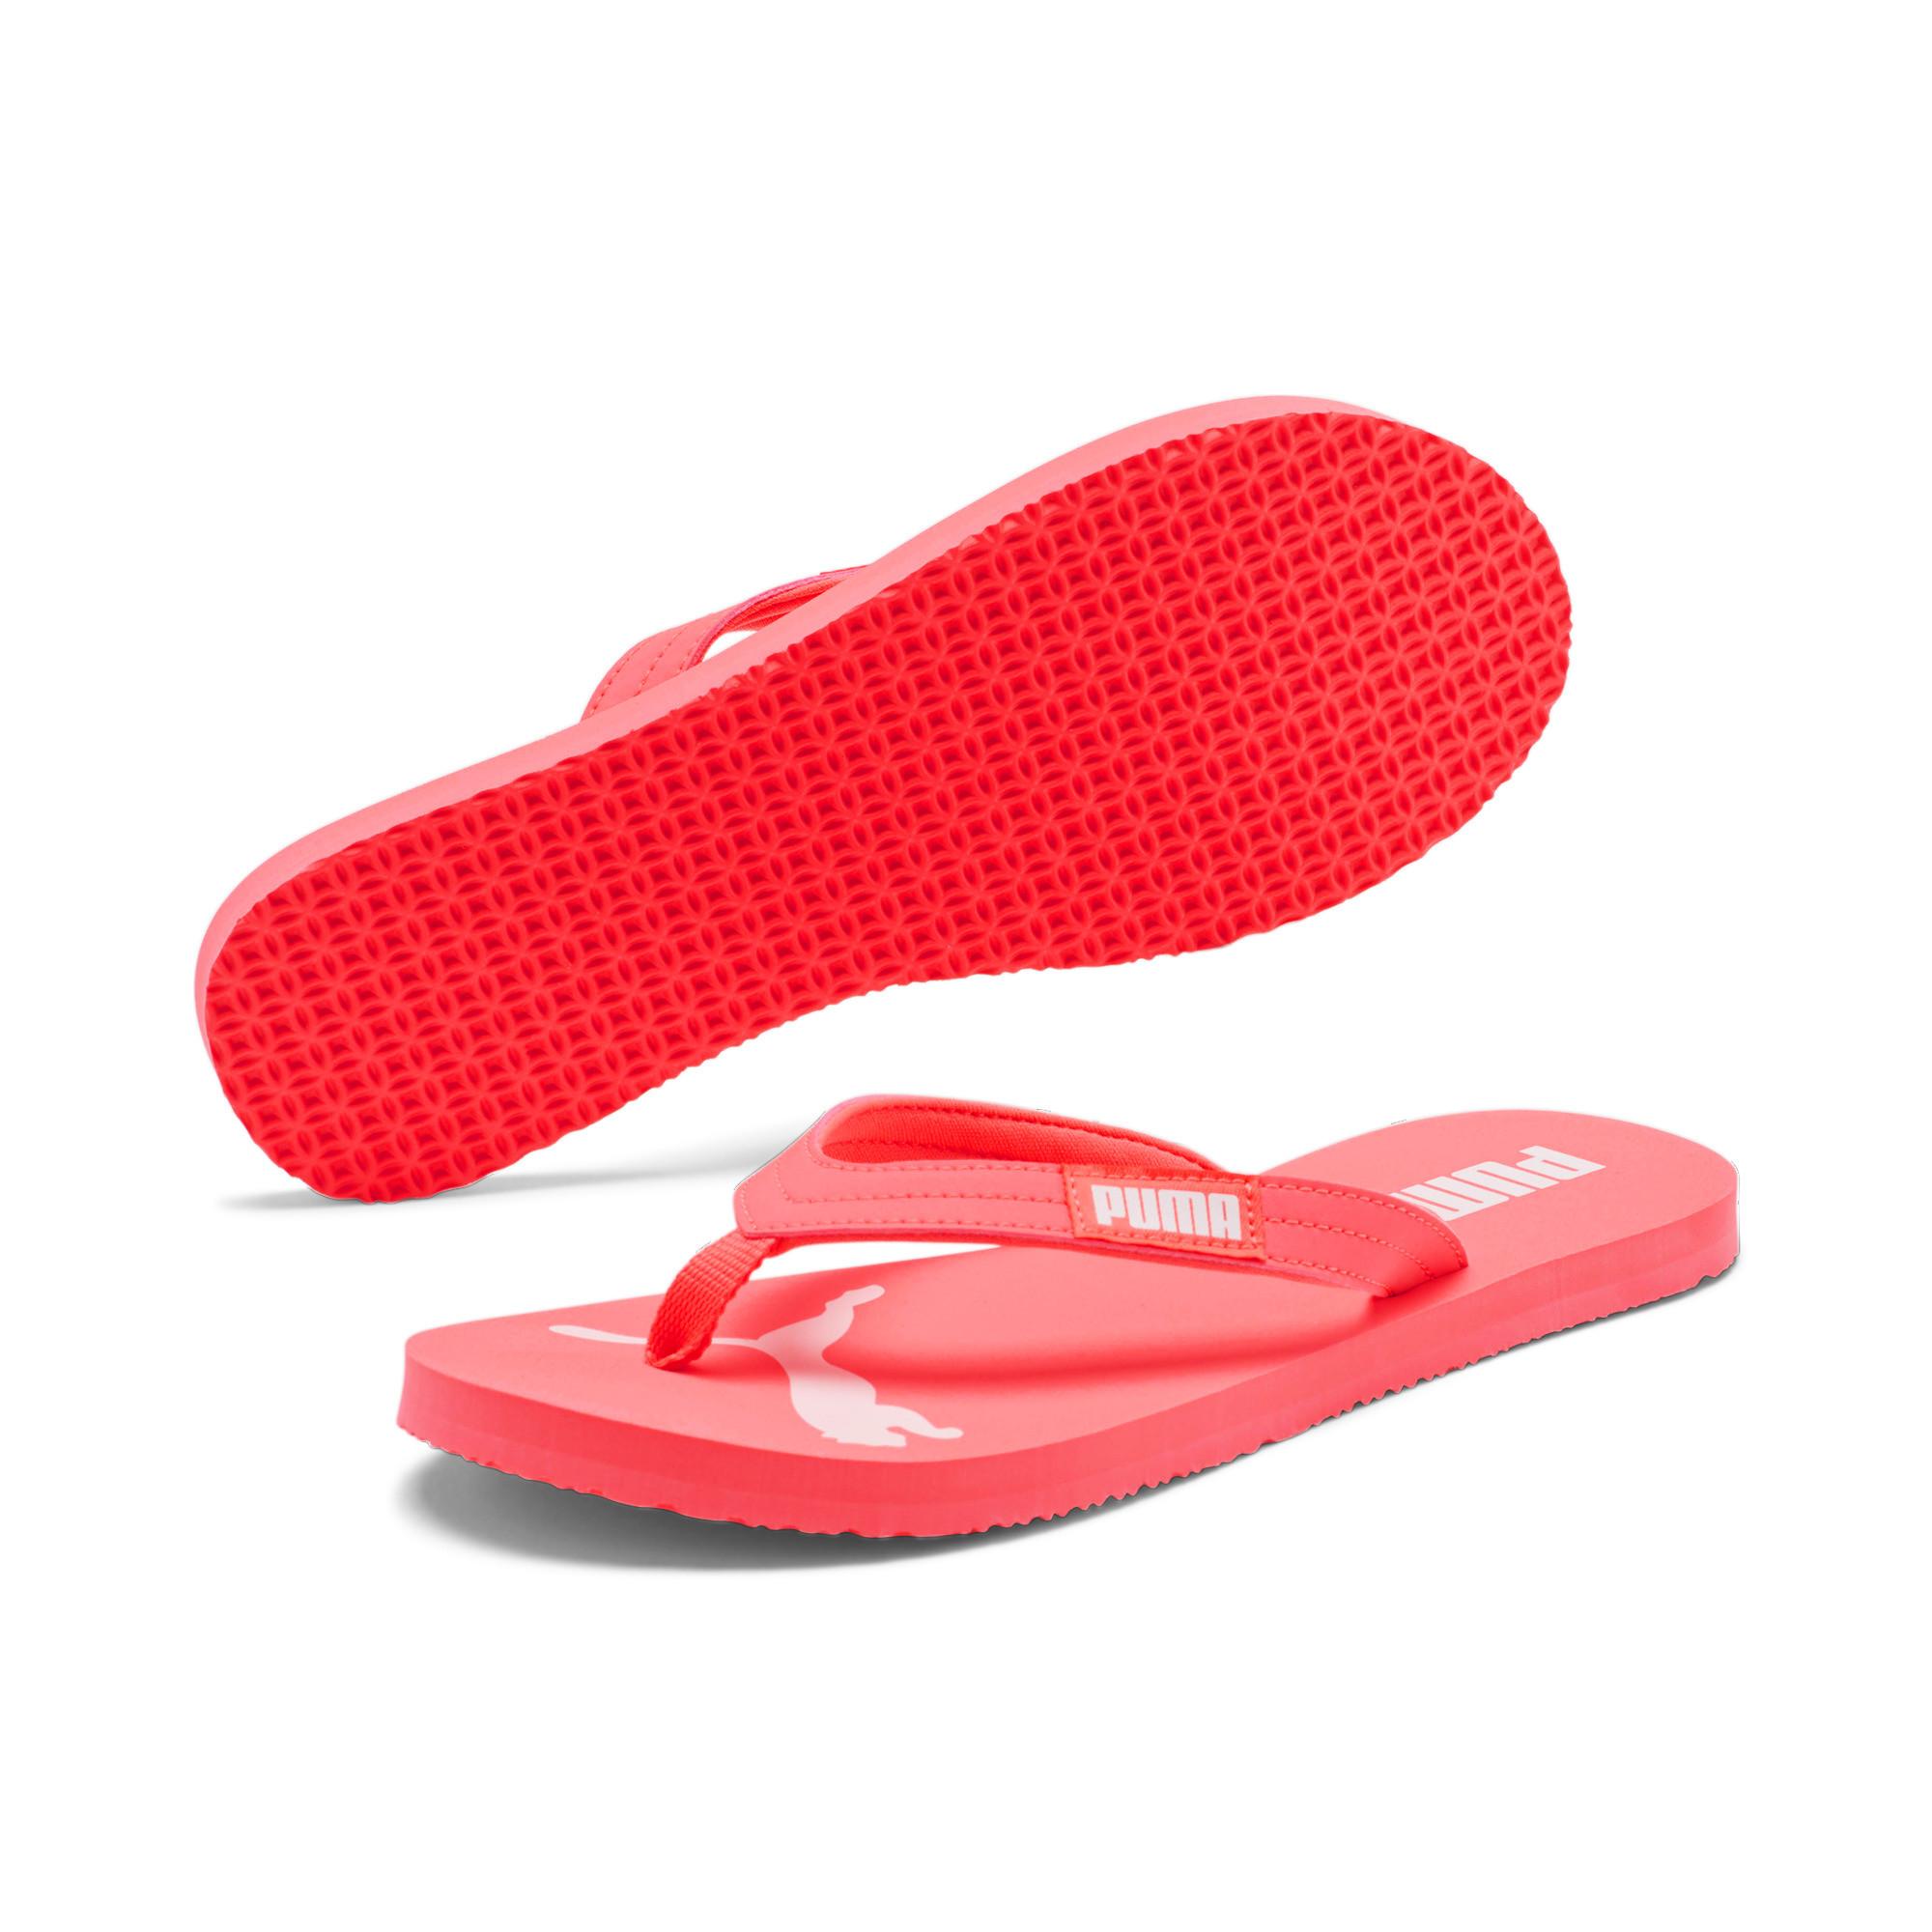 PUMA-Women-039-s-Cozy-Flip-Sandals